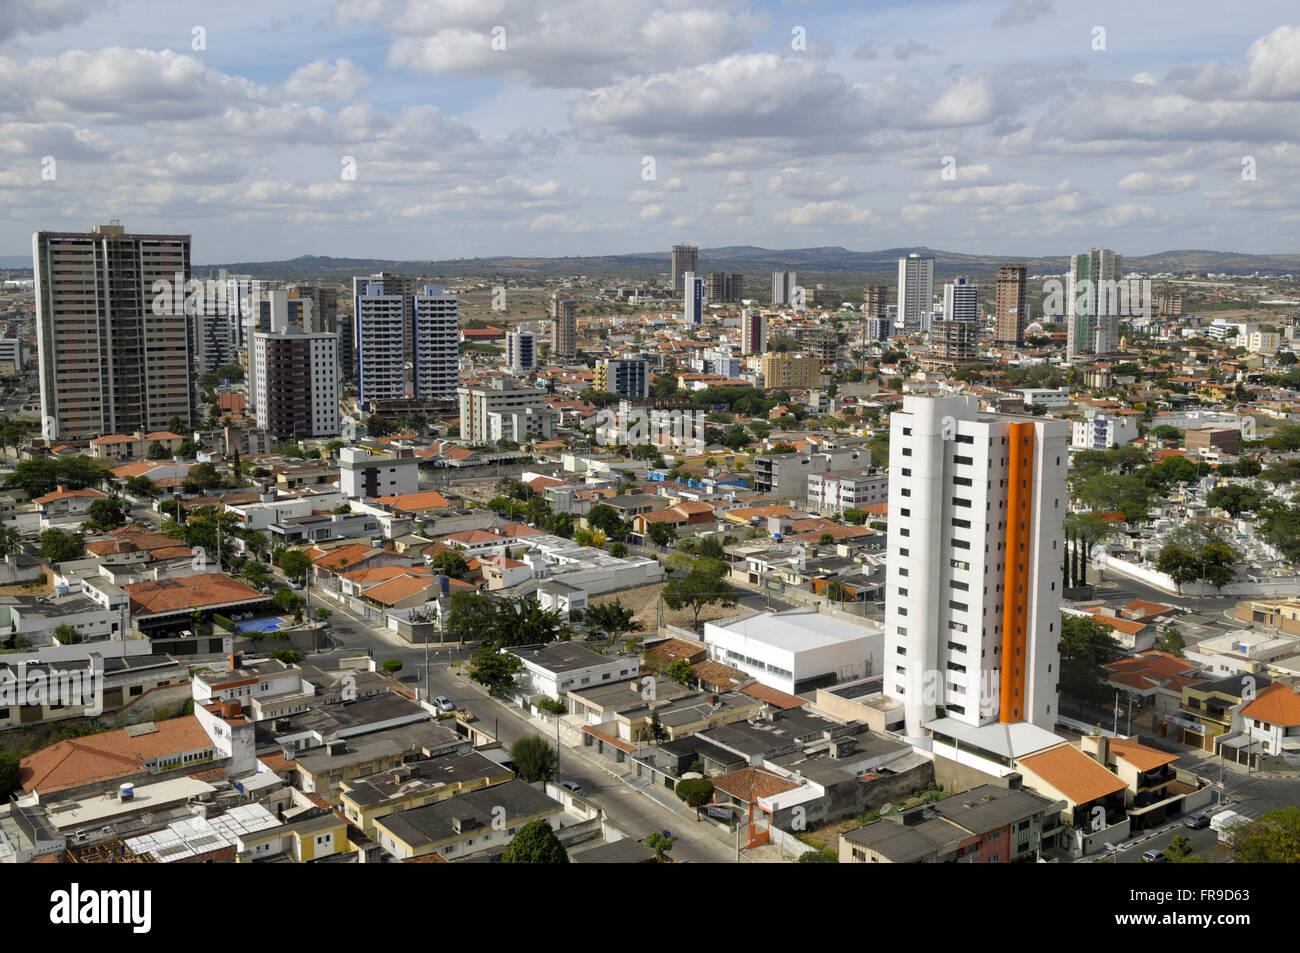 Visa upon Caruaru - residential building in the neighborhood Mauricio de Nassau - Stock Image